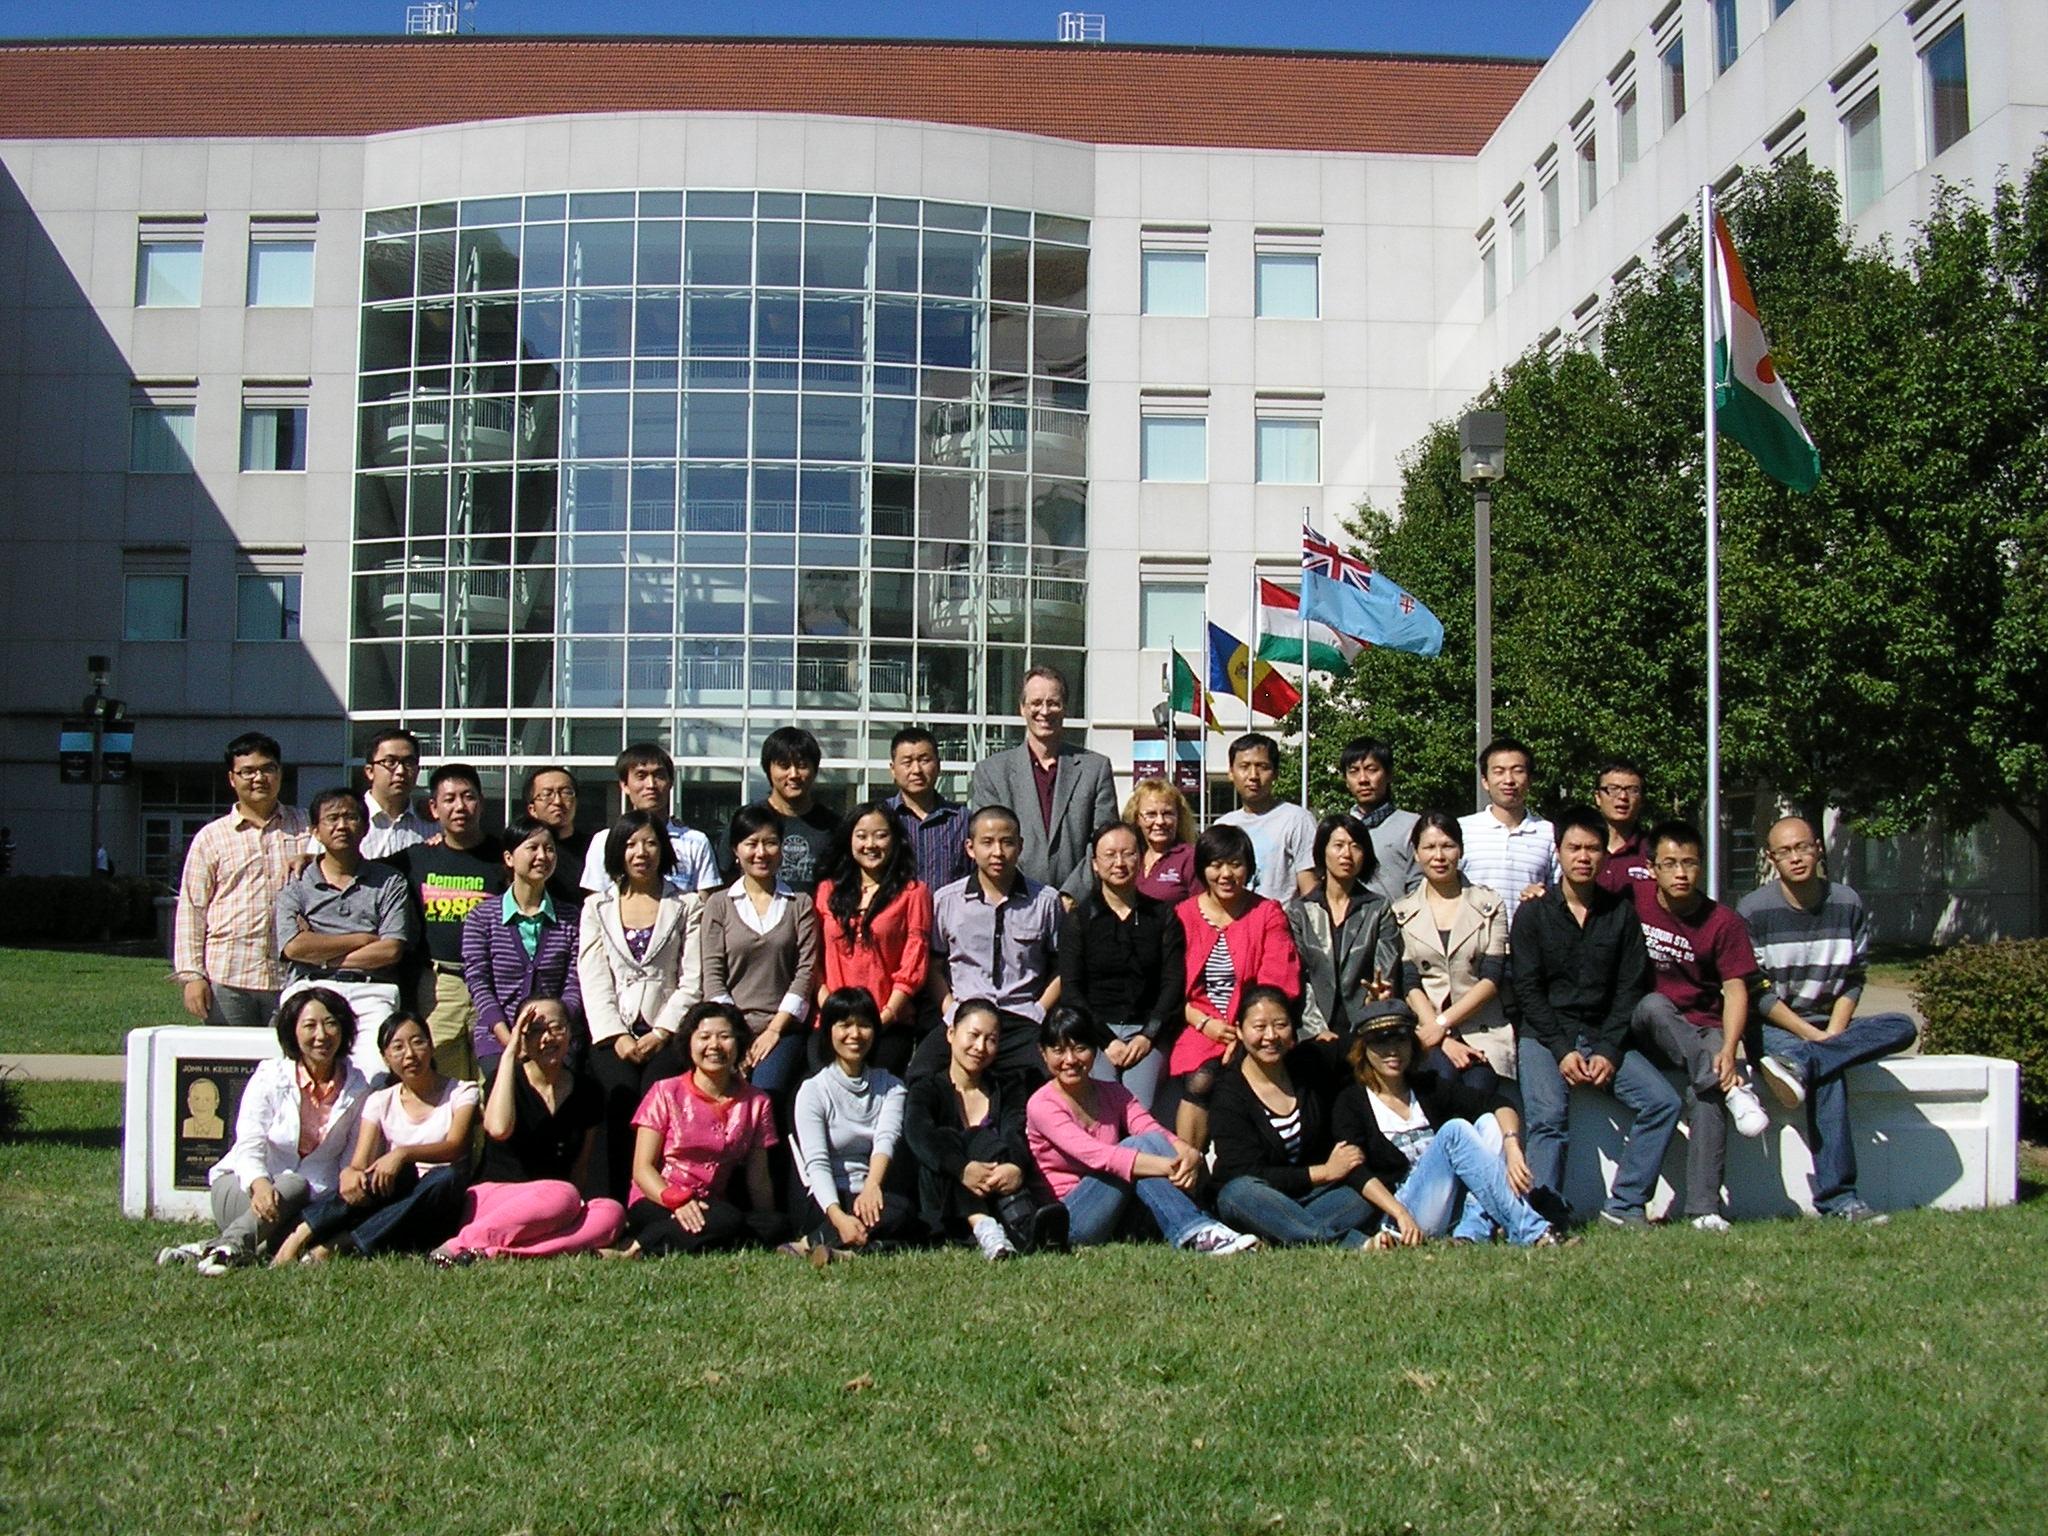 The EMBA program makes a global IMPACT